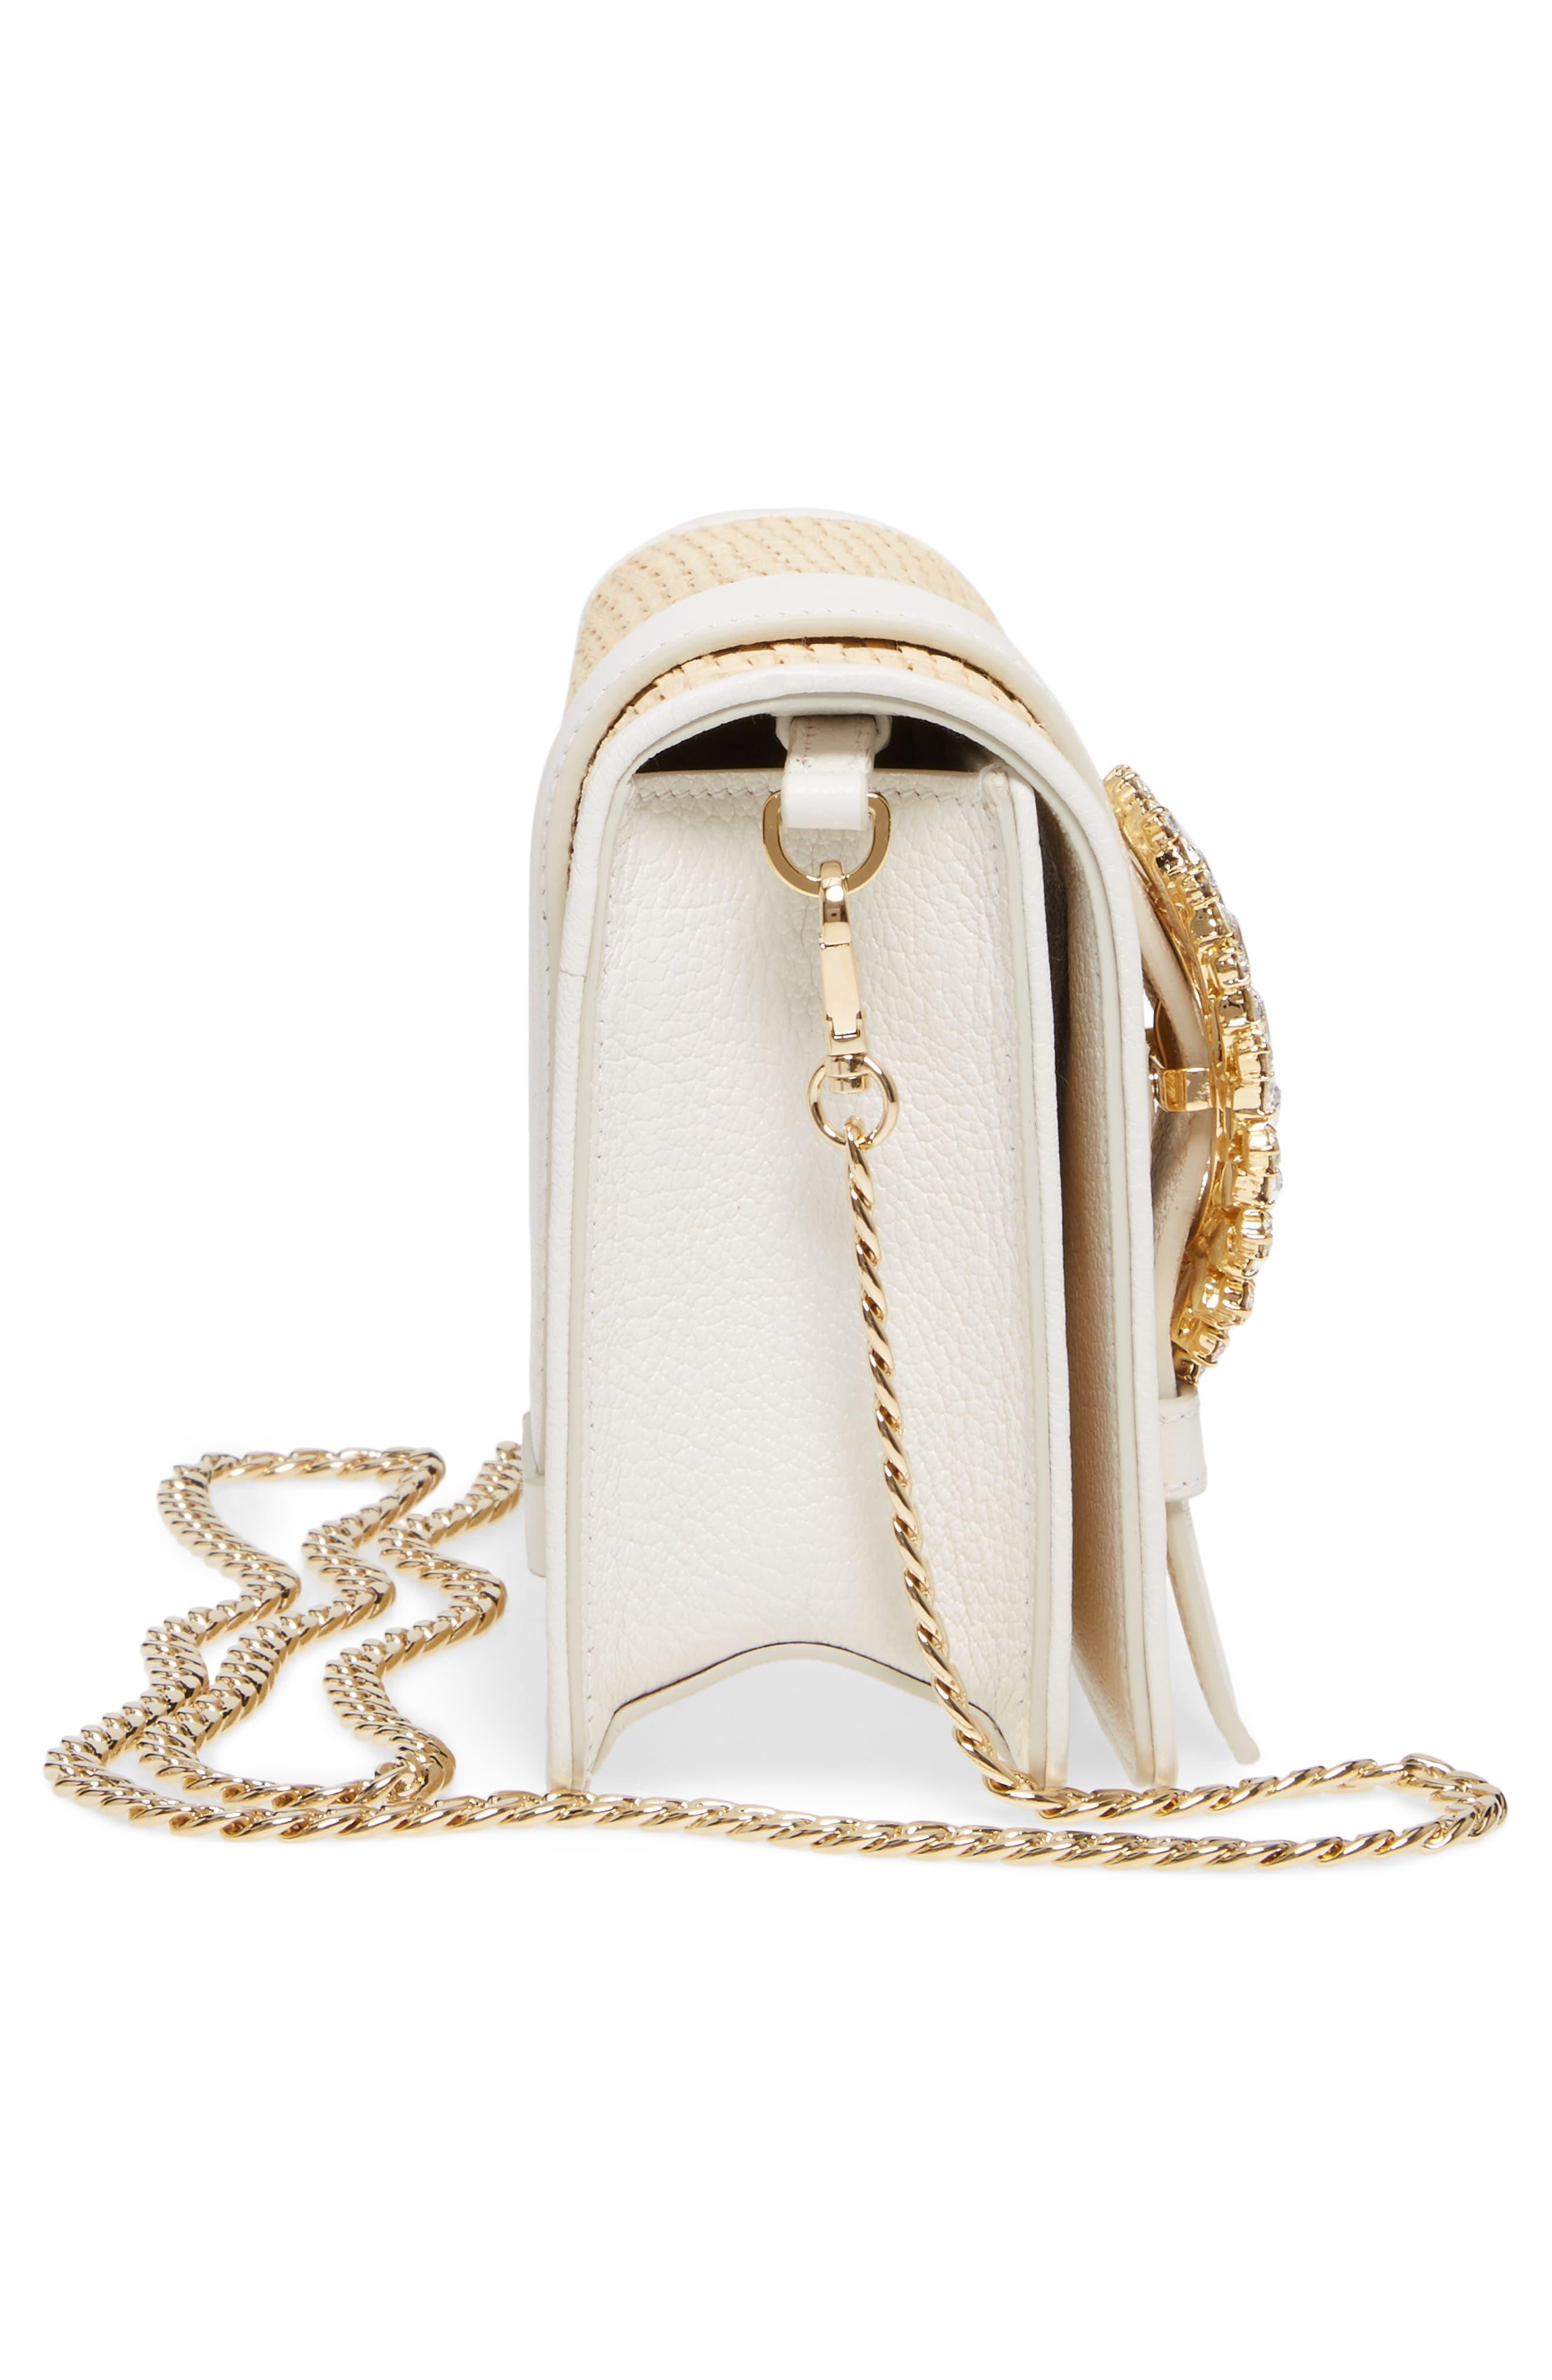 Woven Raffia & Leather Shoulder Bag,                             Alternate thumbnail 5, color,                             Naturale/ Bianco